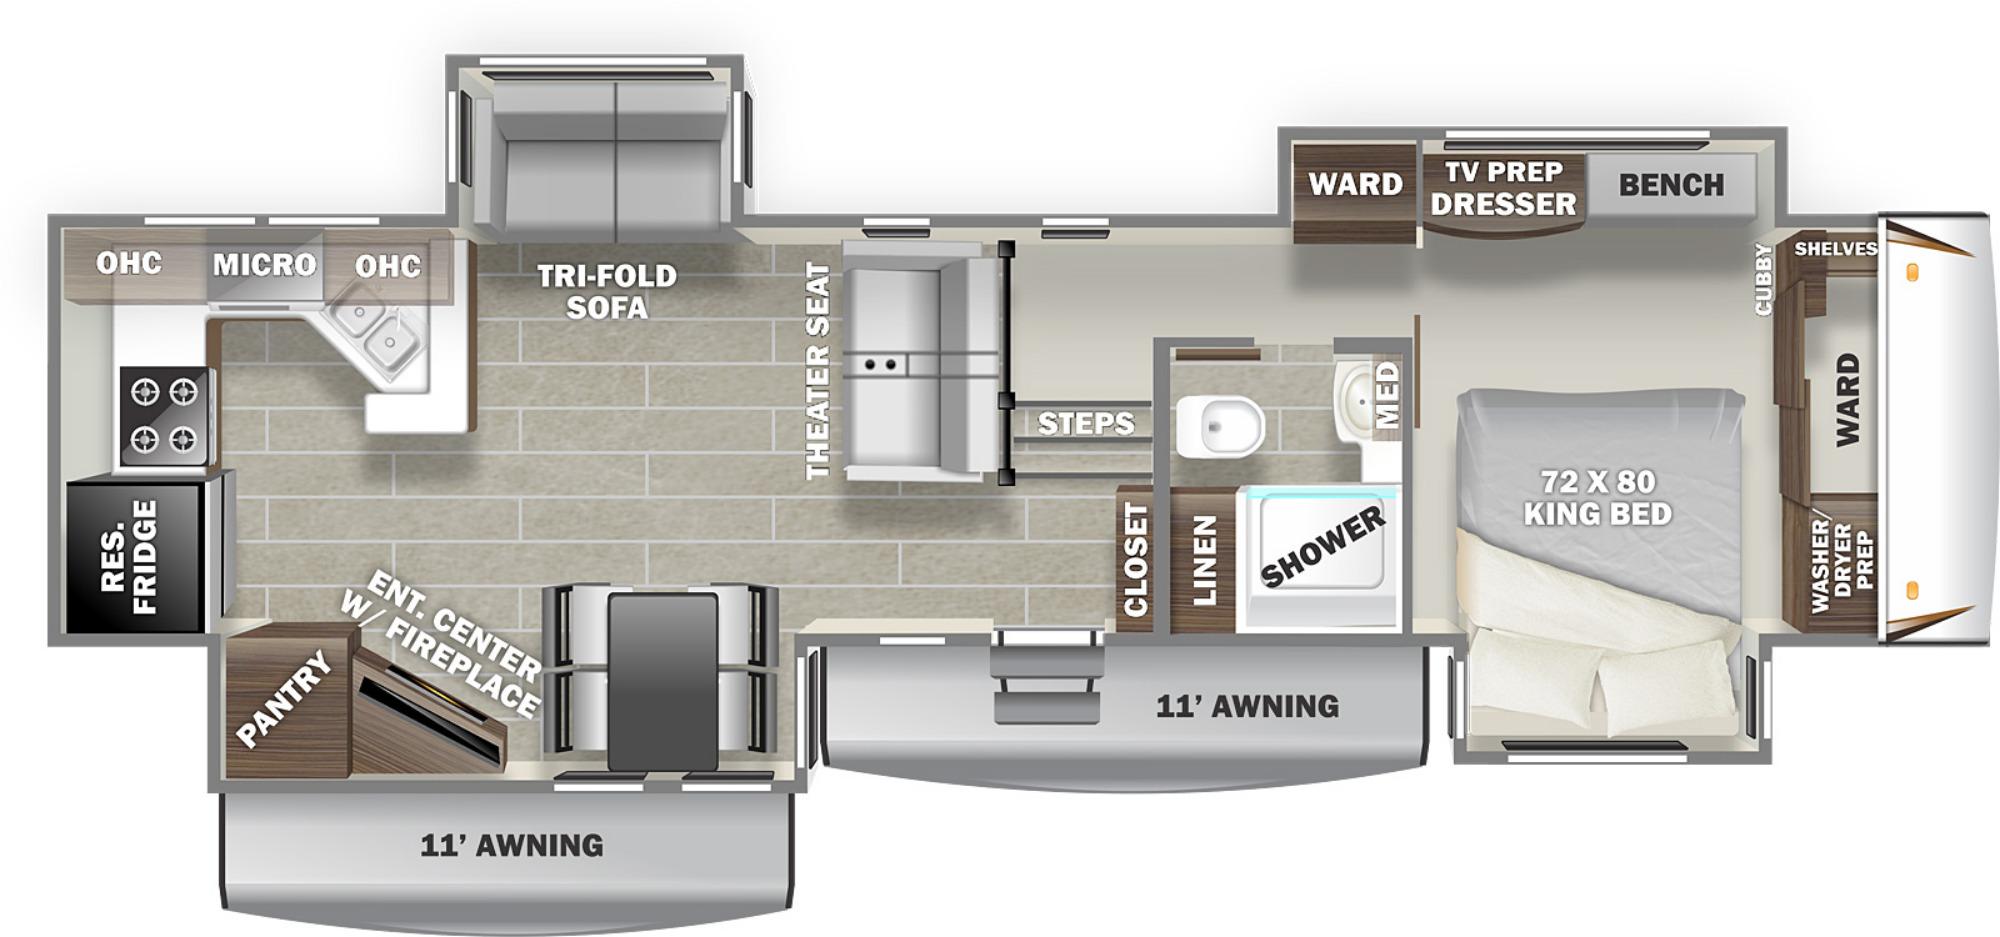 View Floor Plan for 2022 PRIME TIME SANIBEL 3702WB